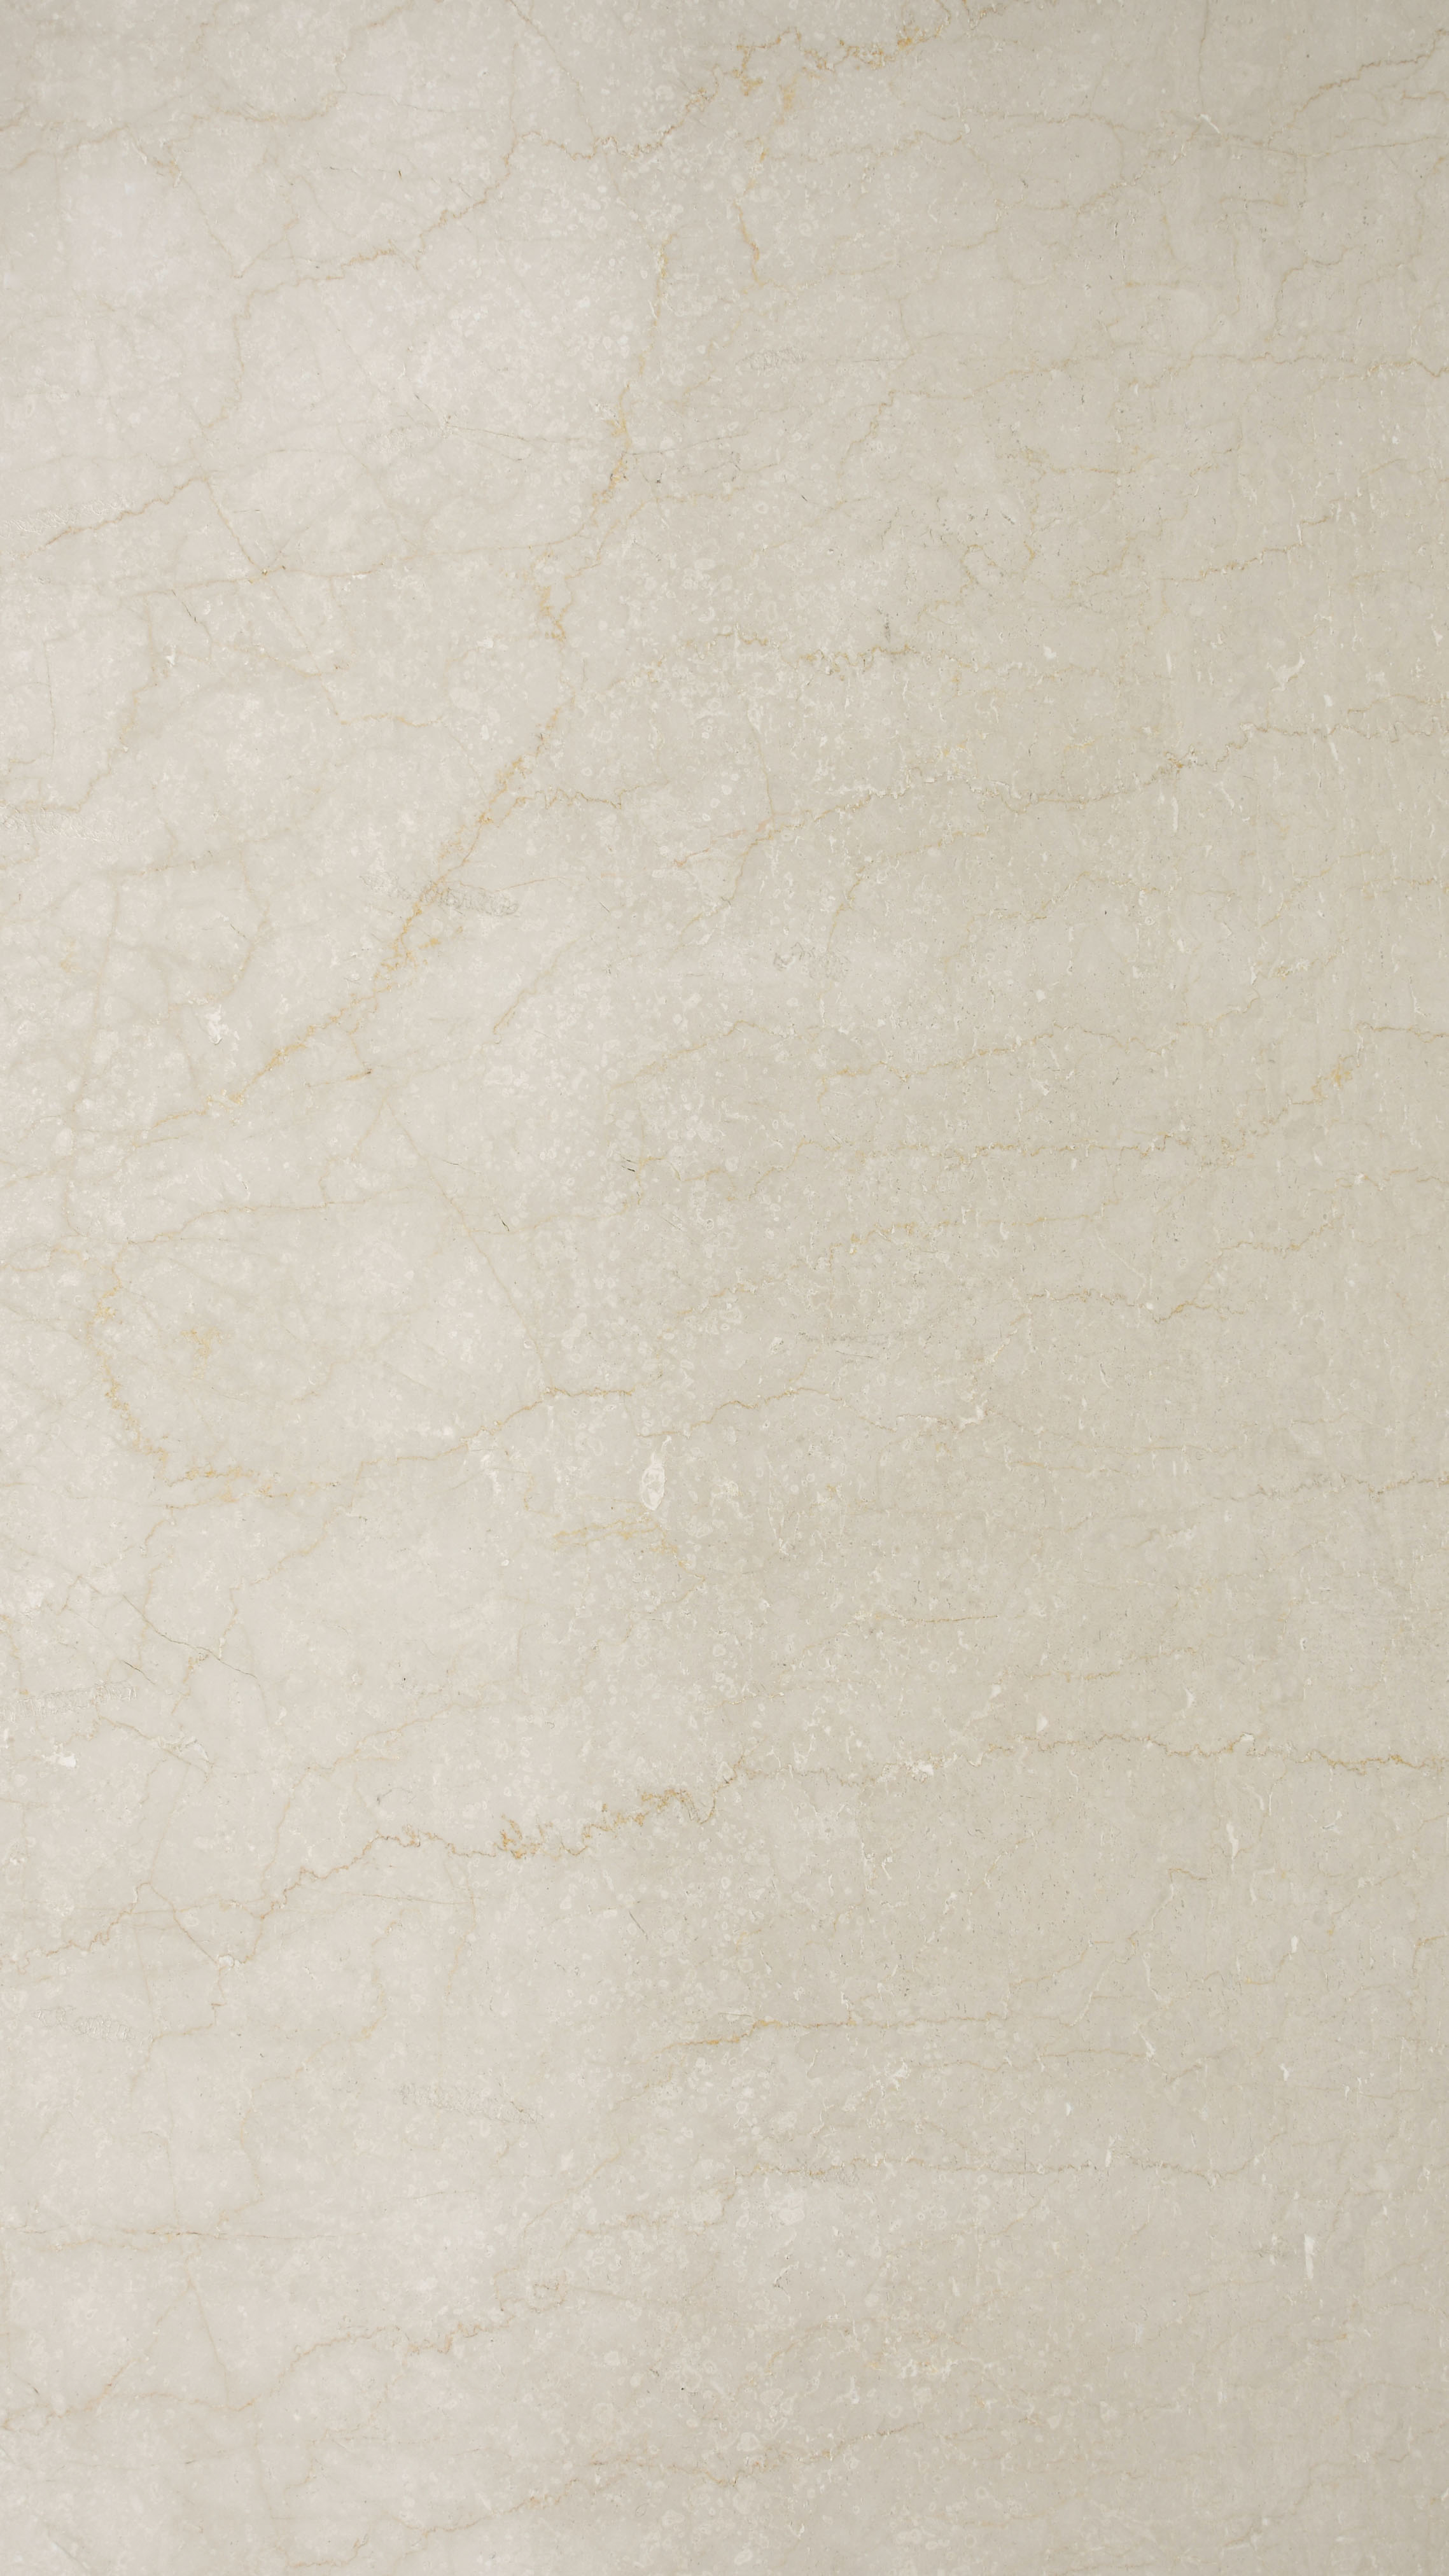 Avorio Dorato Marble